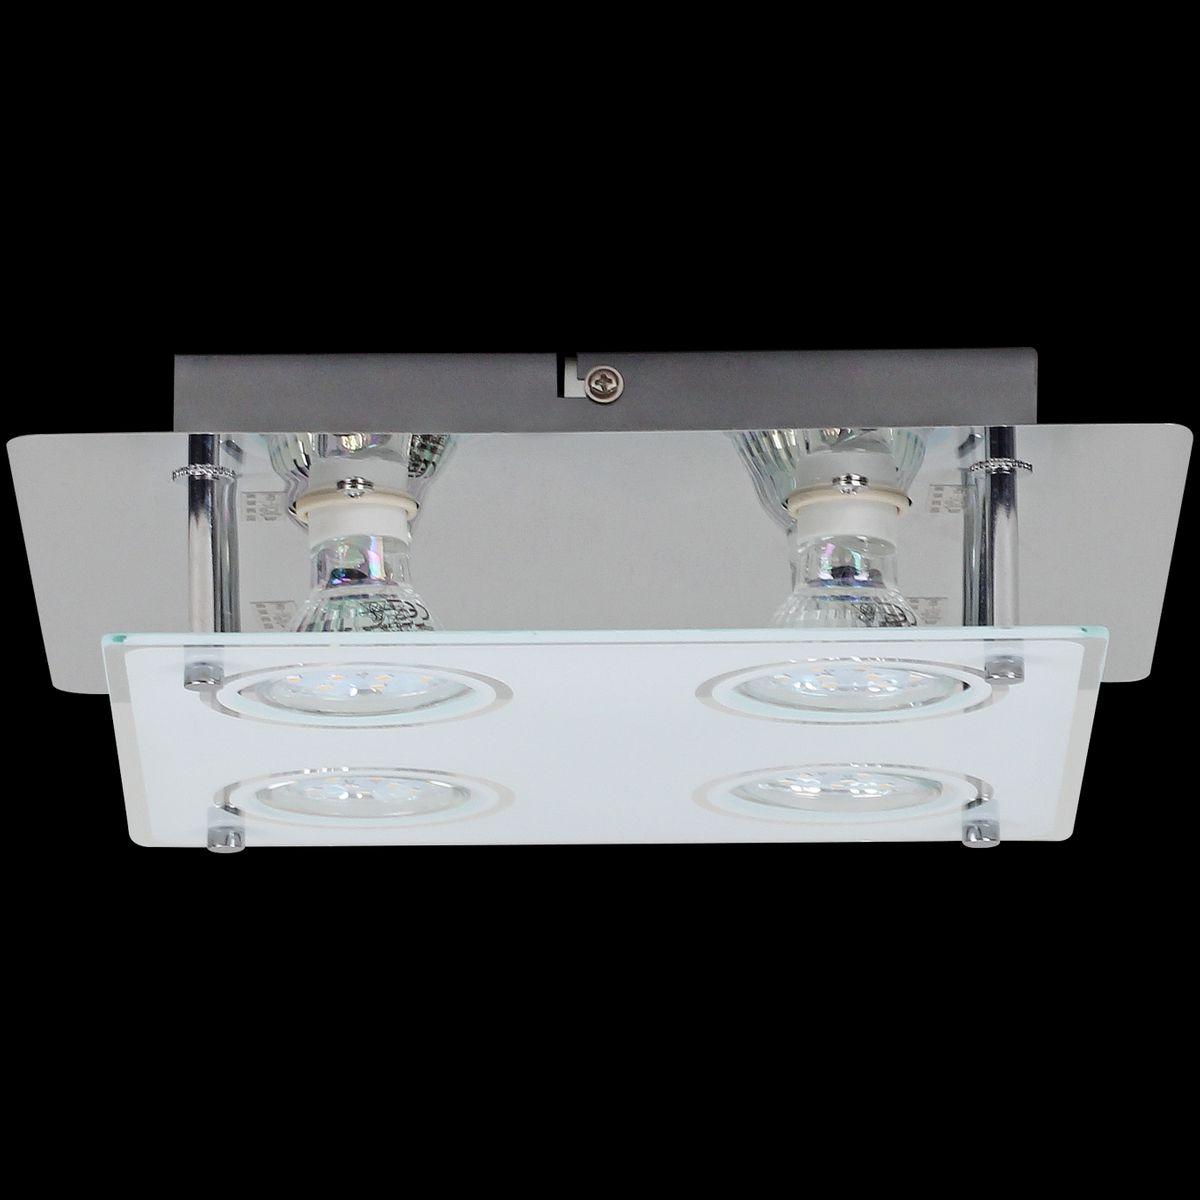 wohnling 4 flammige led deckenlampe gu10 quadratisch inkl 4x 3 watt leuchtmittel. Black Bedroom Furniture Sets. Home Design Ideas